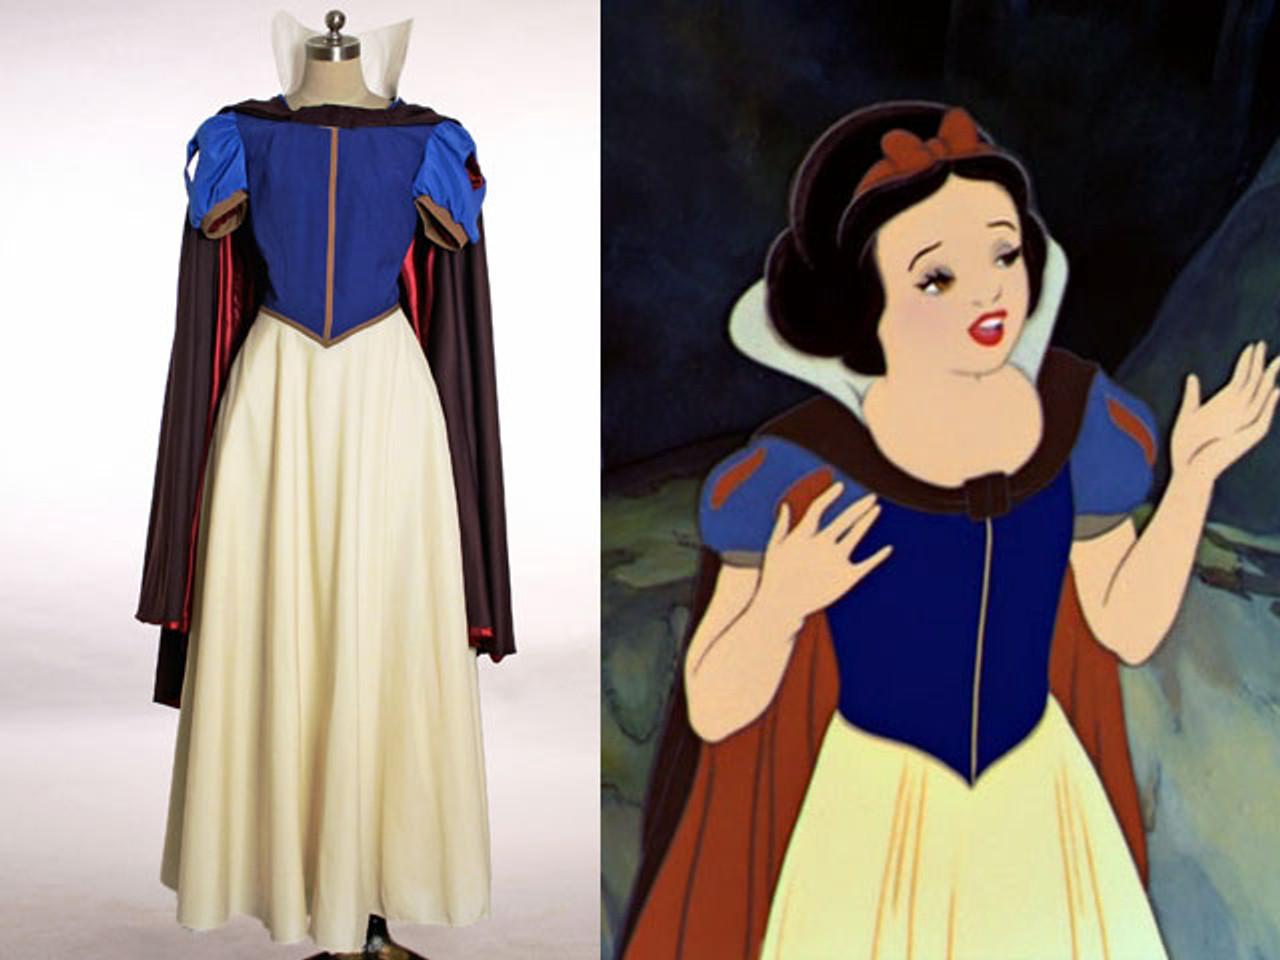 Disney Snow White and the Seven Dwarfs Cosplay, Princess Snow White Costume